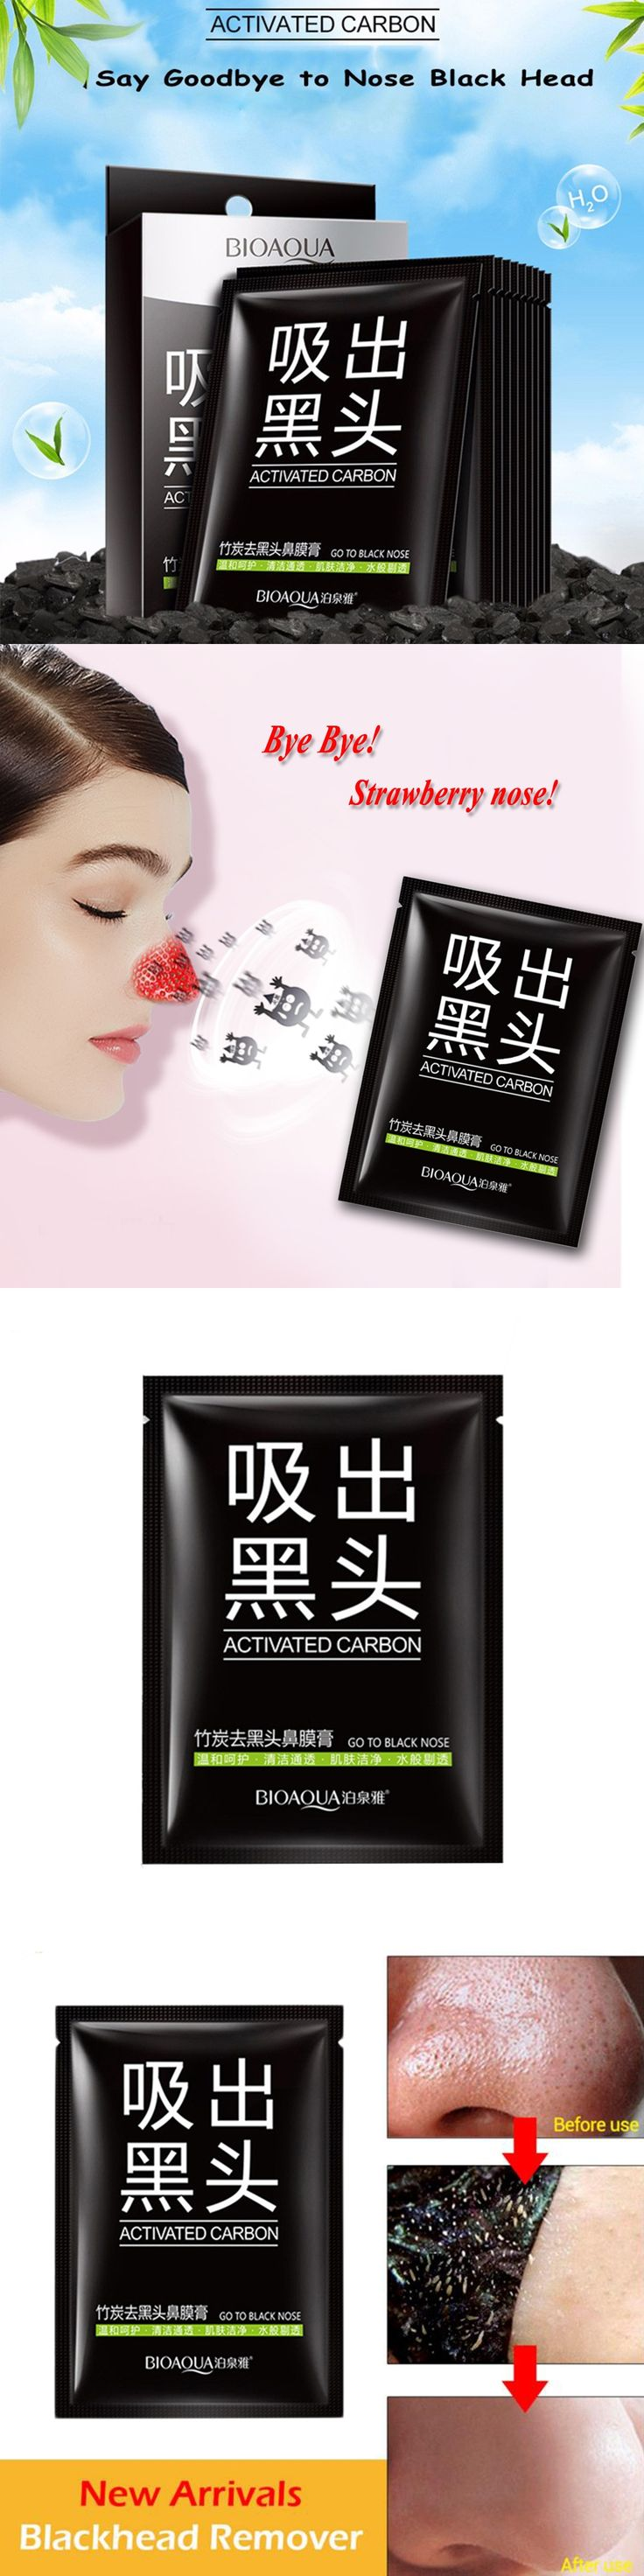 Face Minerals Conk Nose Blackhead Remover Mask Pore Cleanser , Black Head EX Pore Strip Black Mask Face Mask 8g